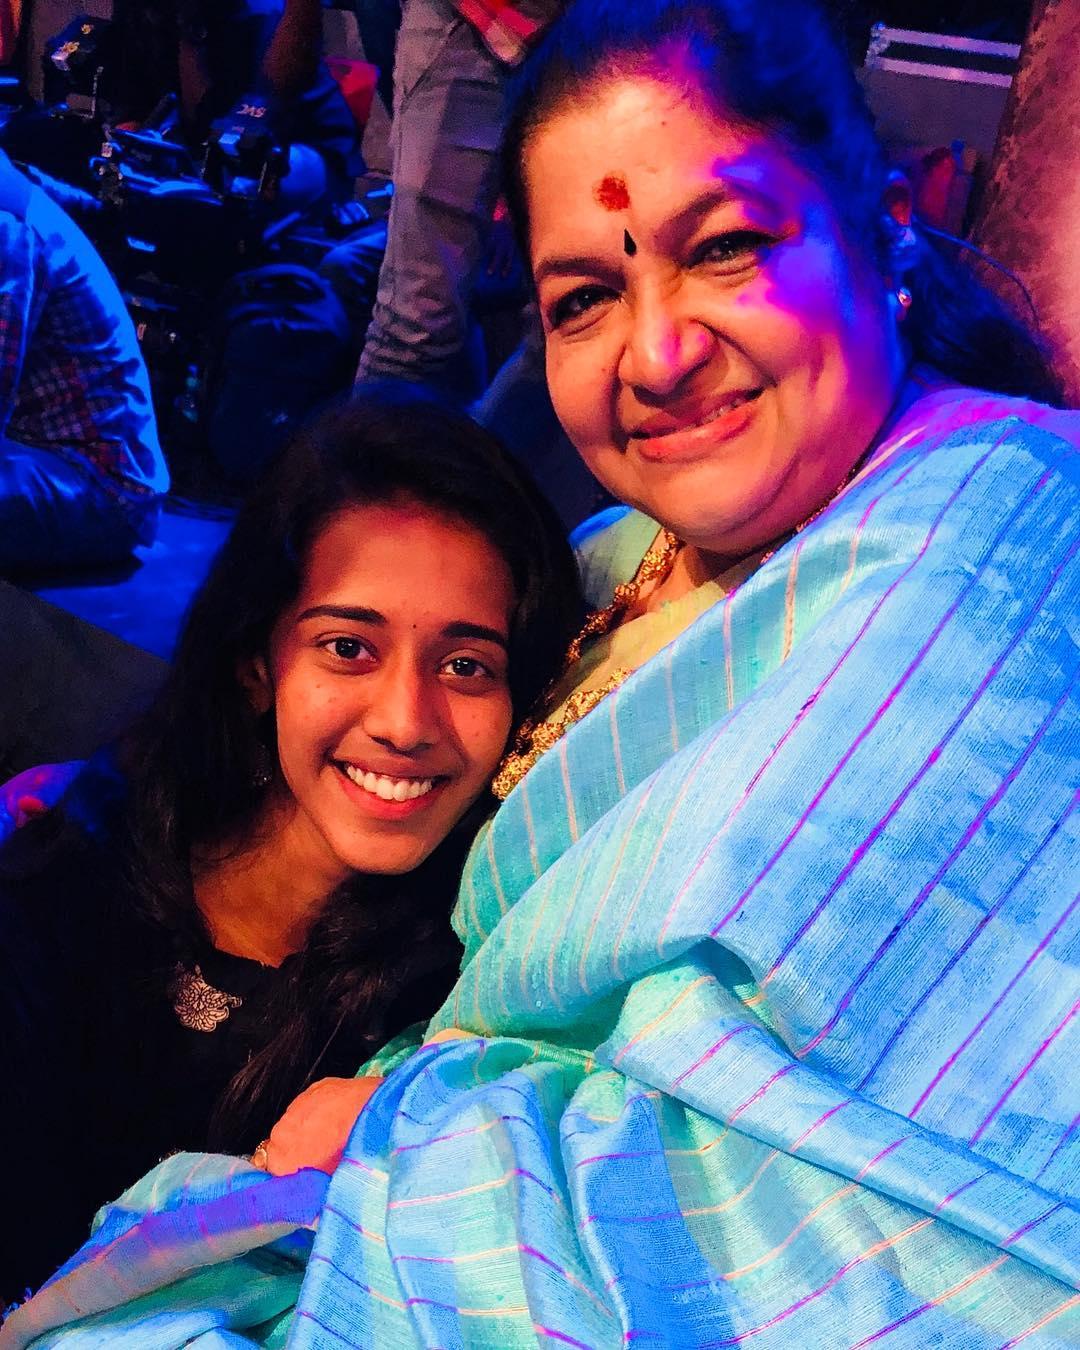 World Music Day 2021 - Super Singer Priyanka